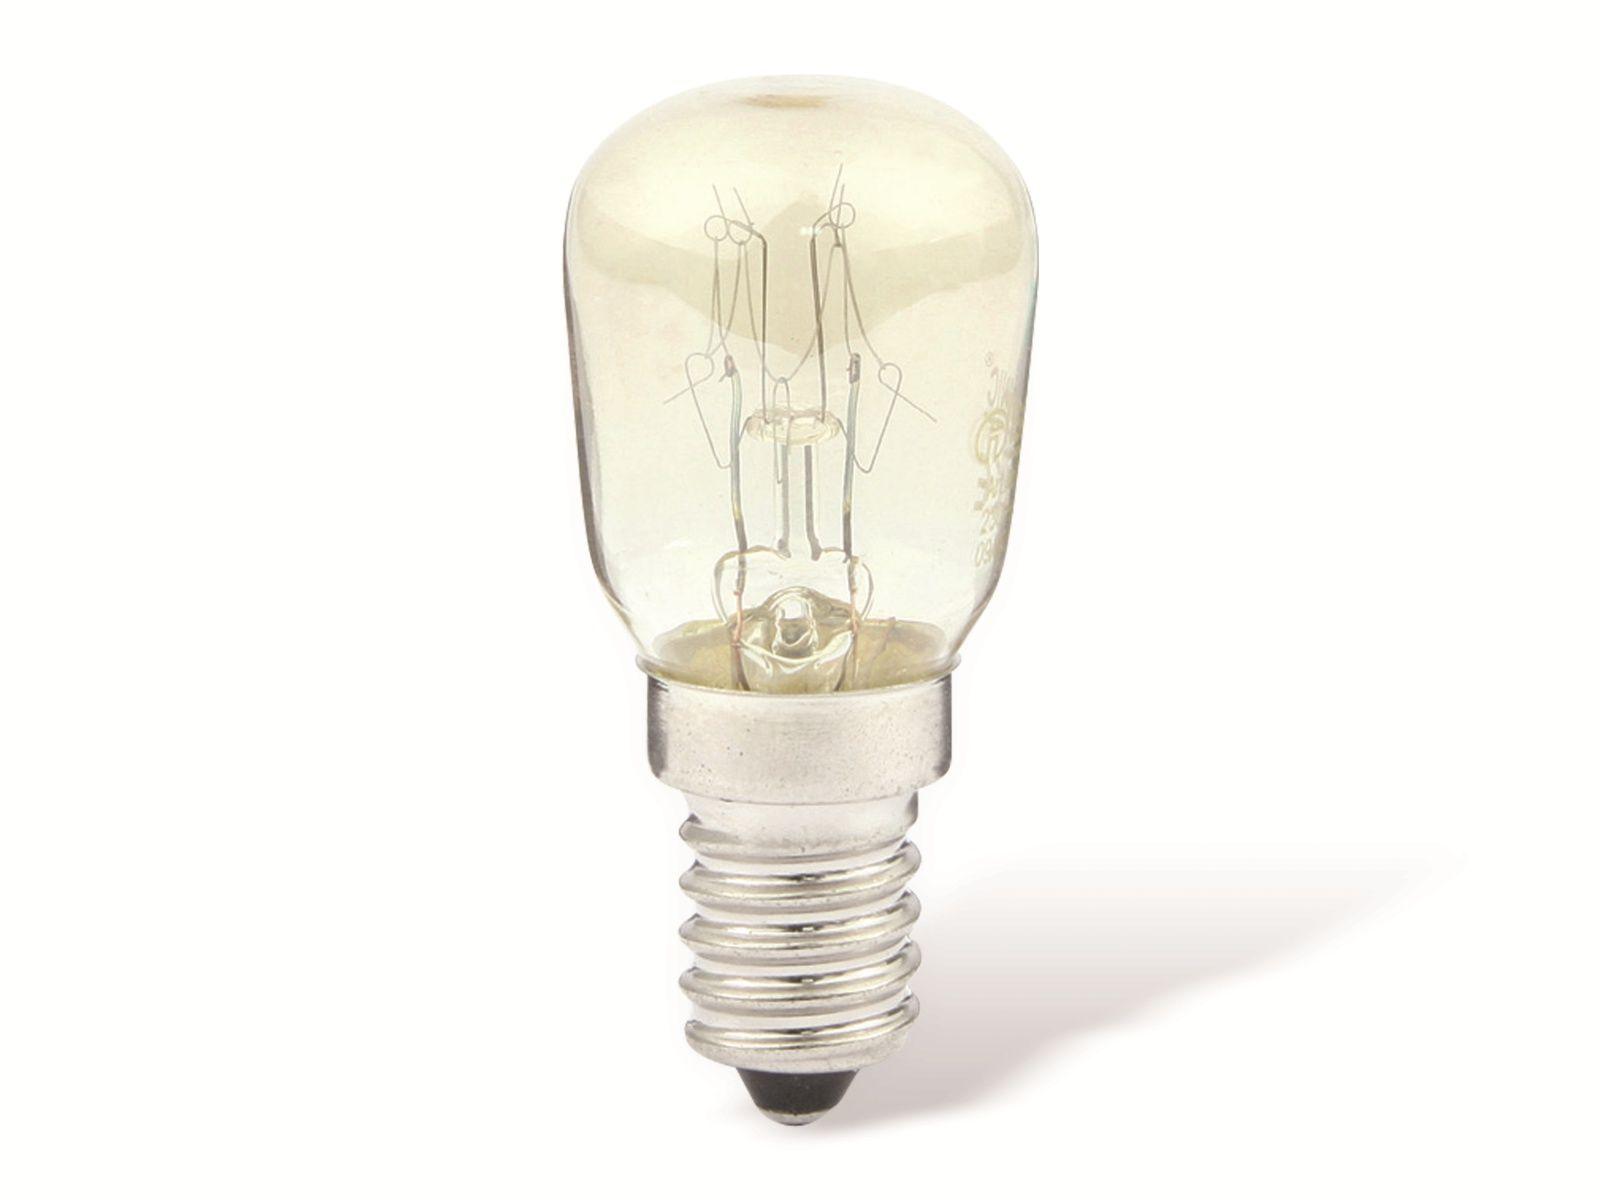 Kühlschrank Lampe 15w : Speziallampen online kaufen bei pollin.de